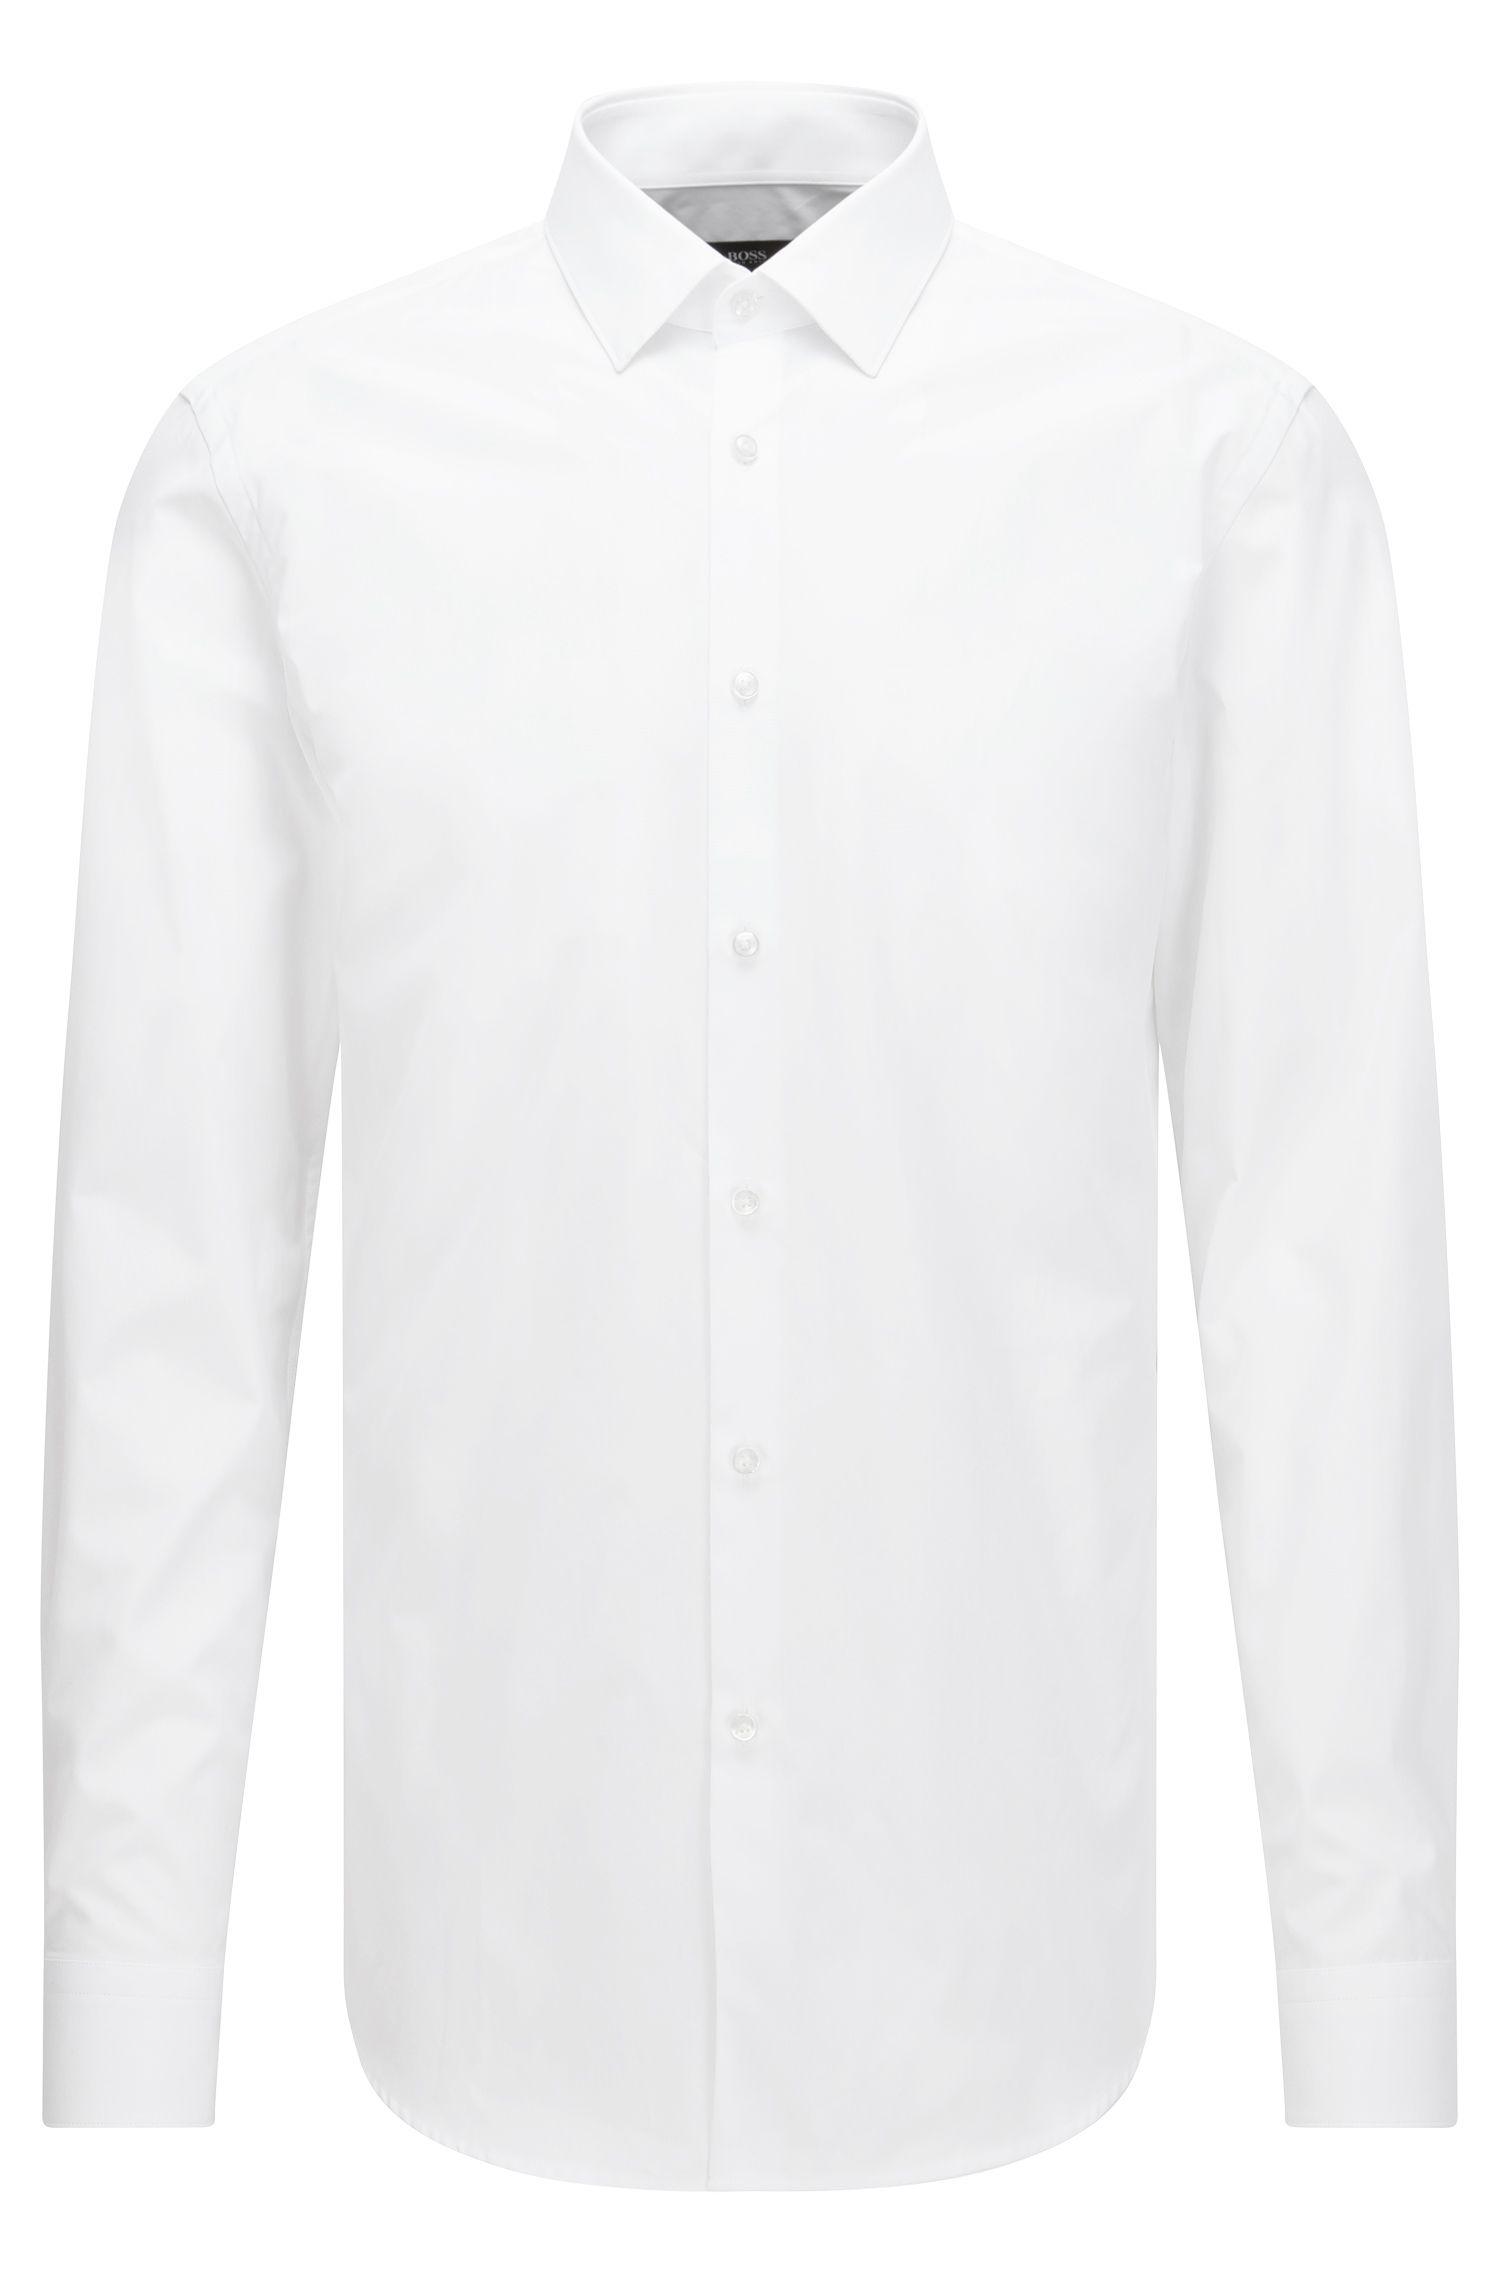 Two-Ply Cotton Dress Shirt, Slim Fit | Isko